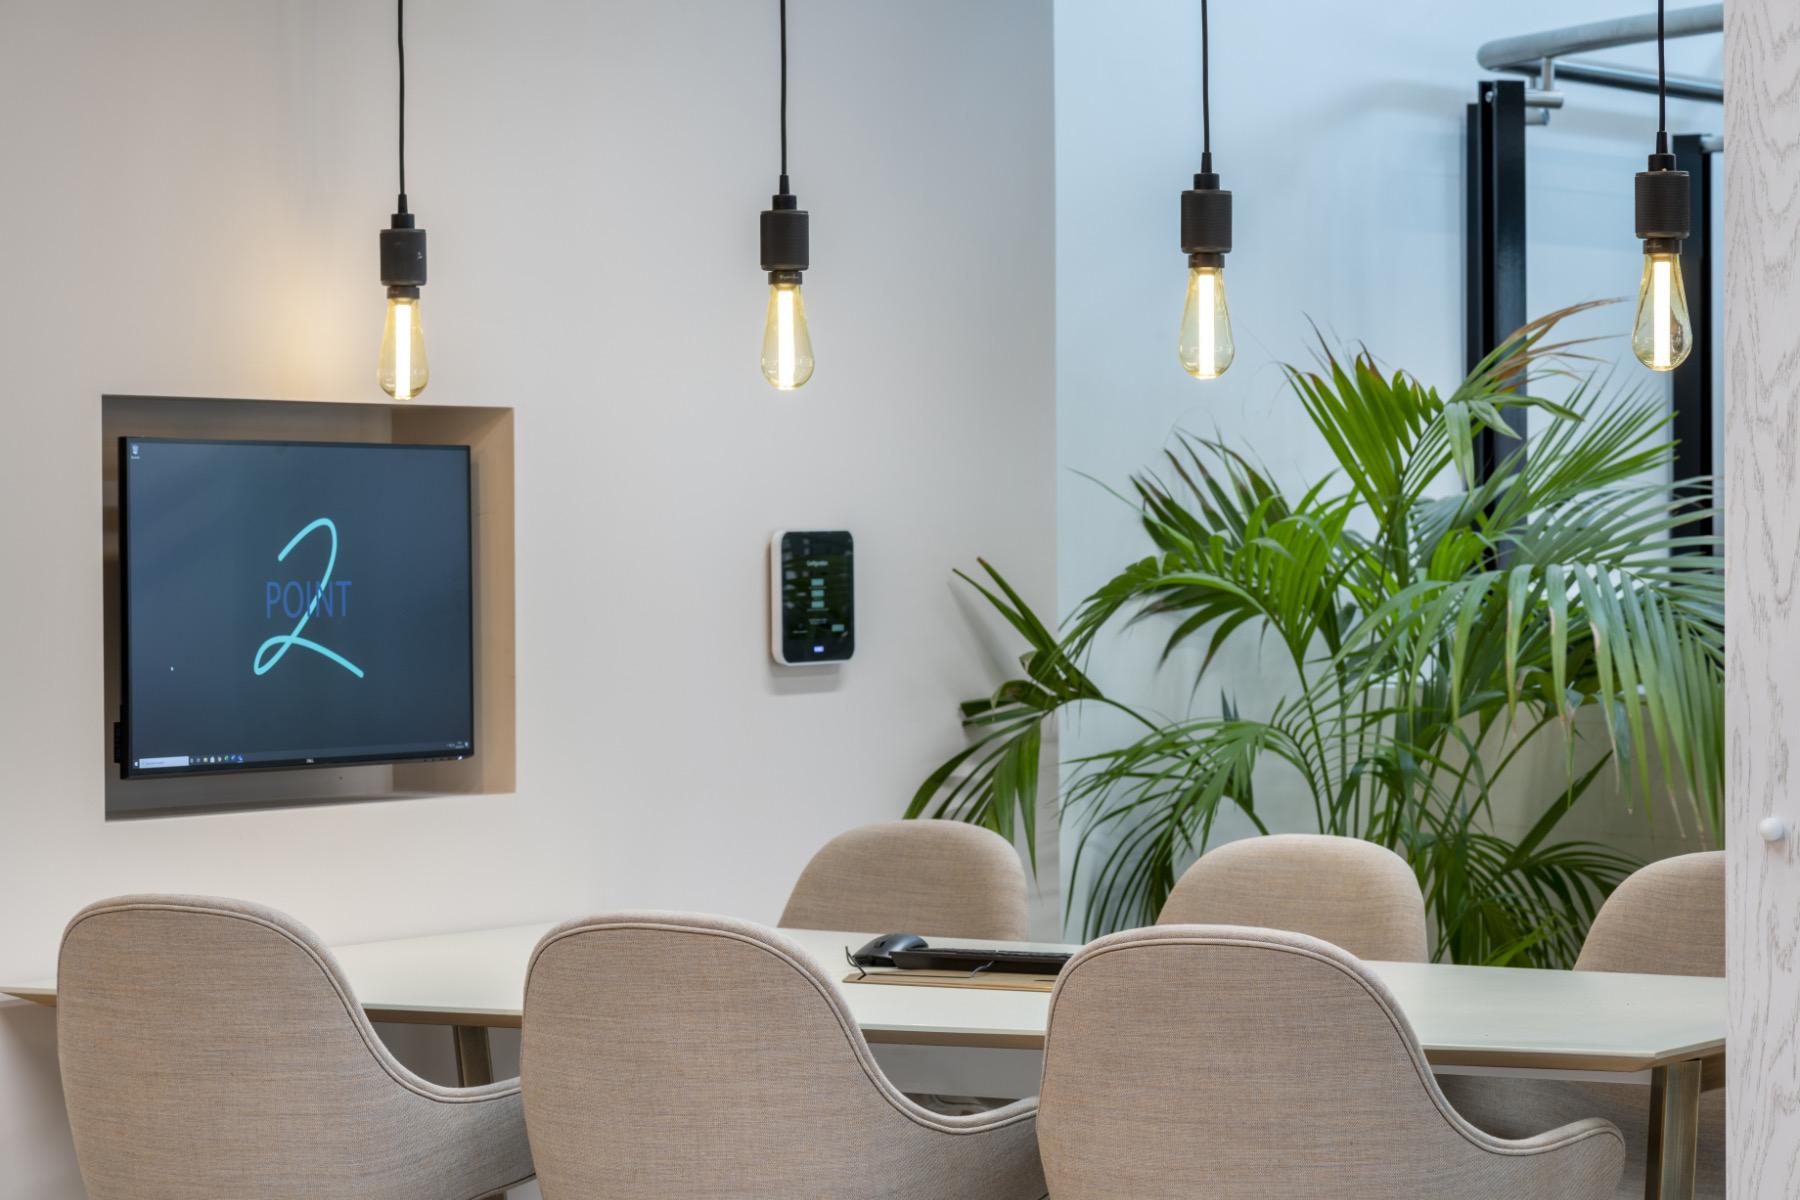 point-2-london-office-11